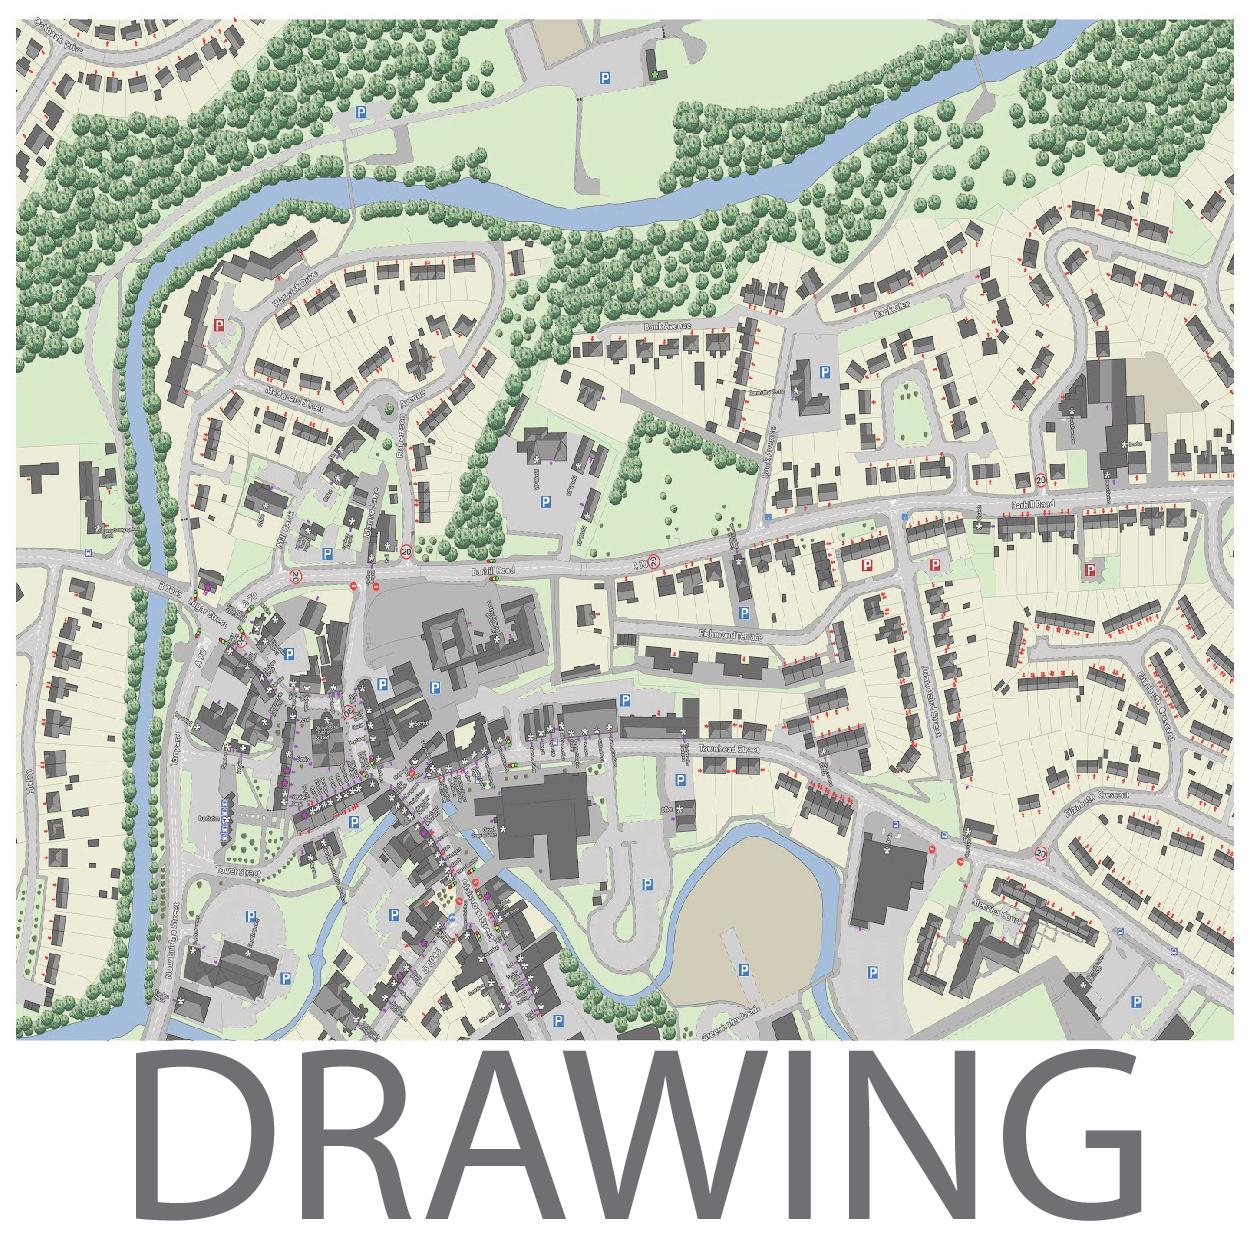 1250x1250 Drawing The Existing City Udsu